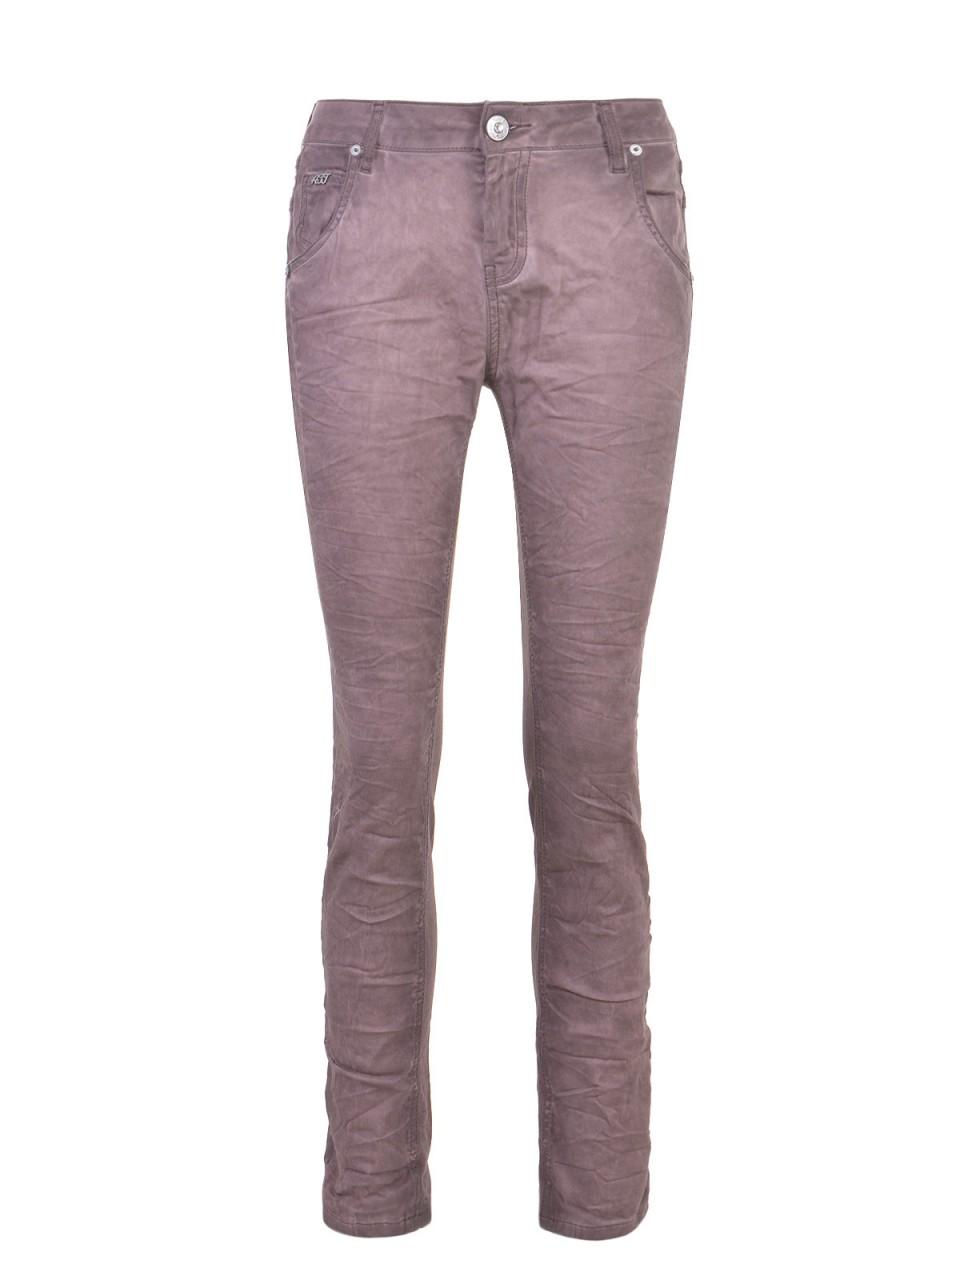 att-damen-jeans-bordeaux